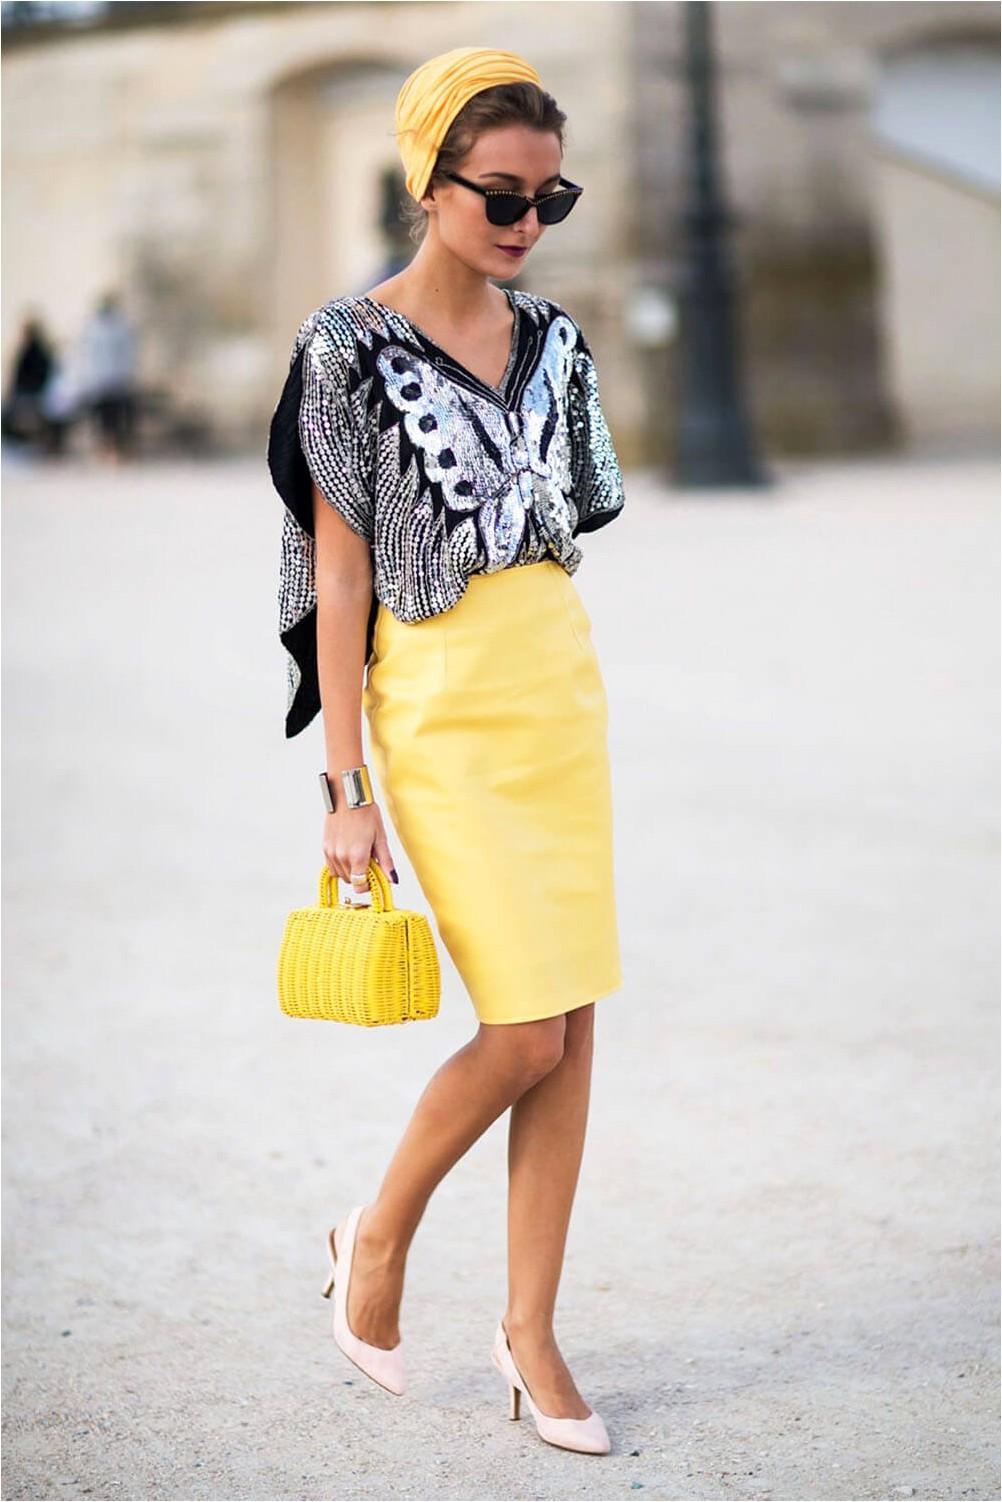 An informal look with a pencil skirt